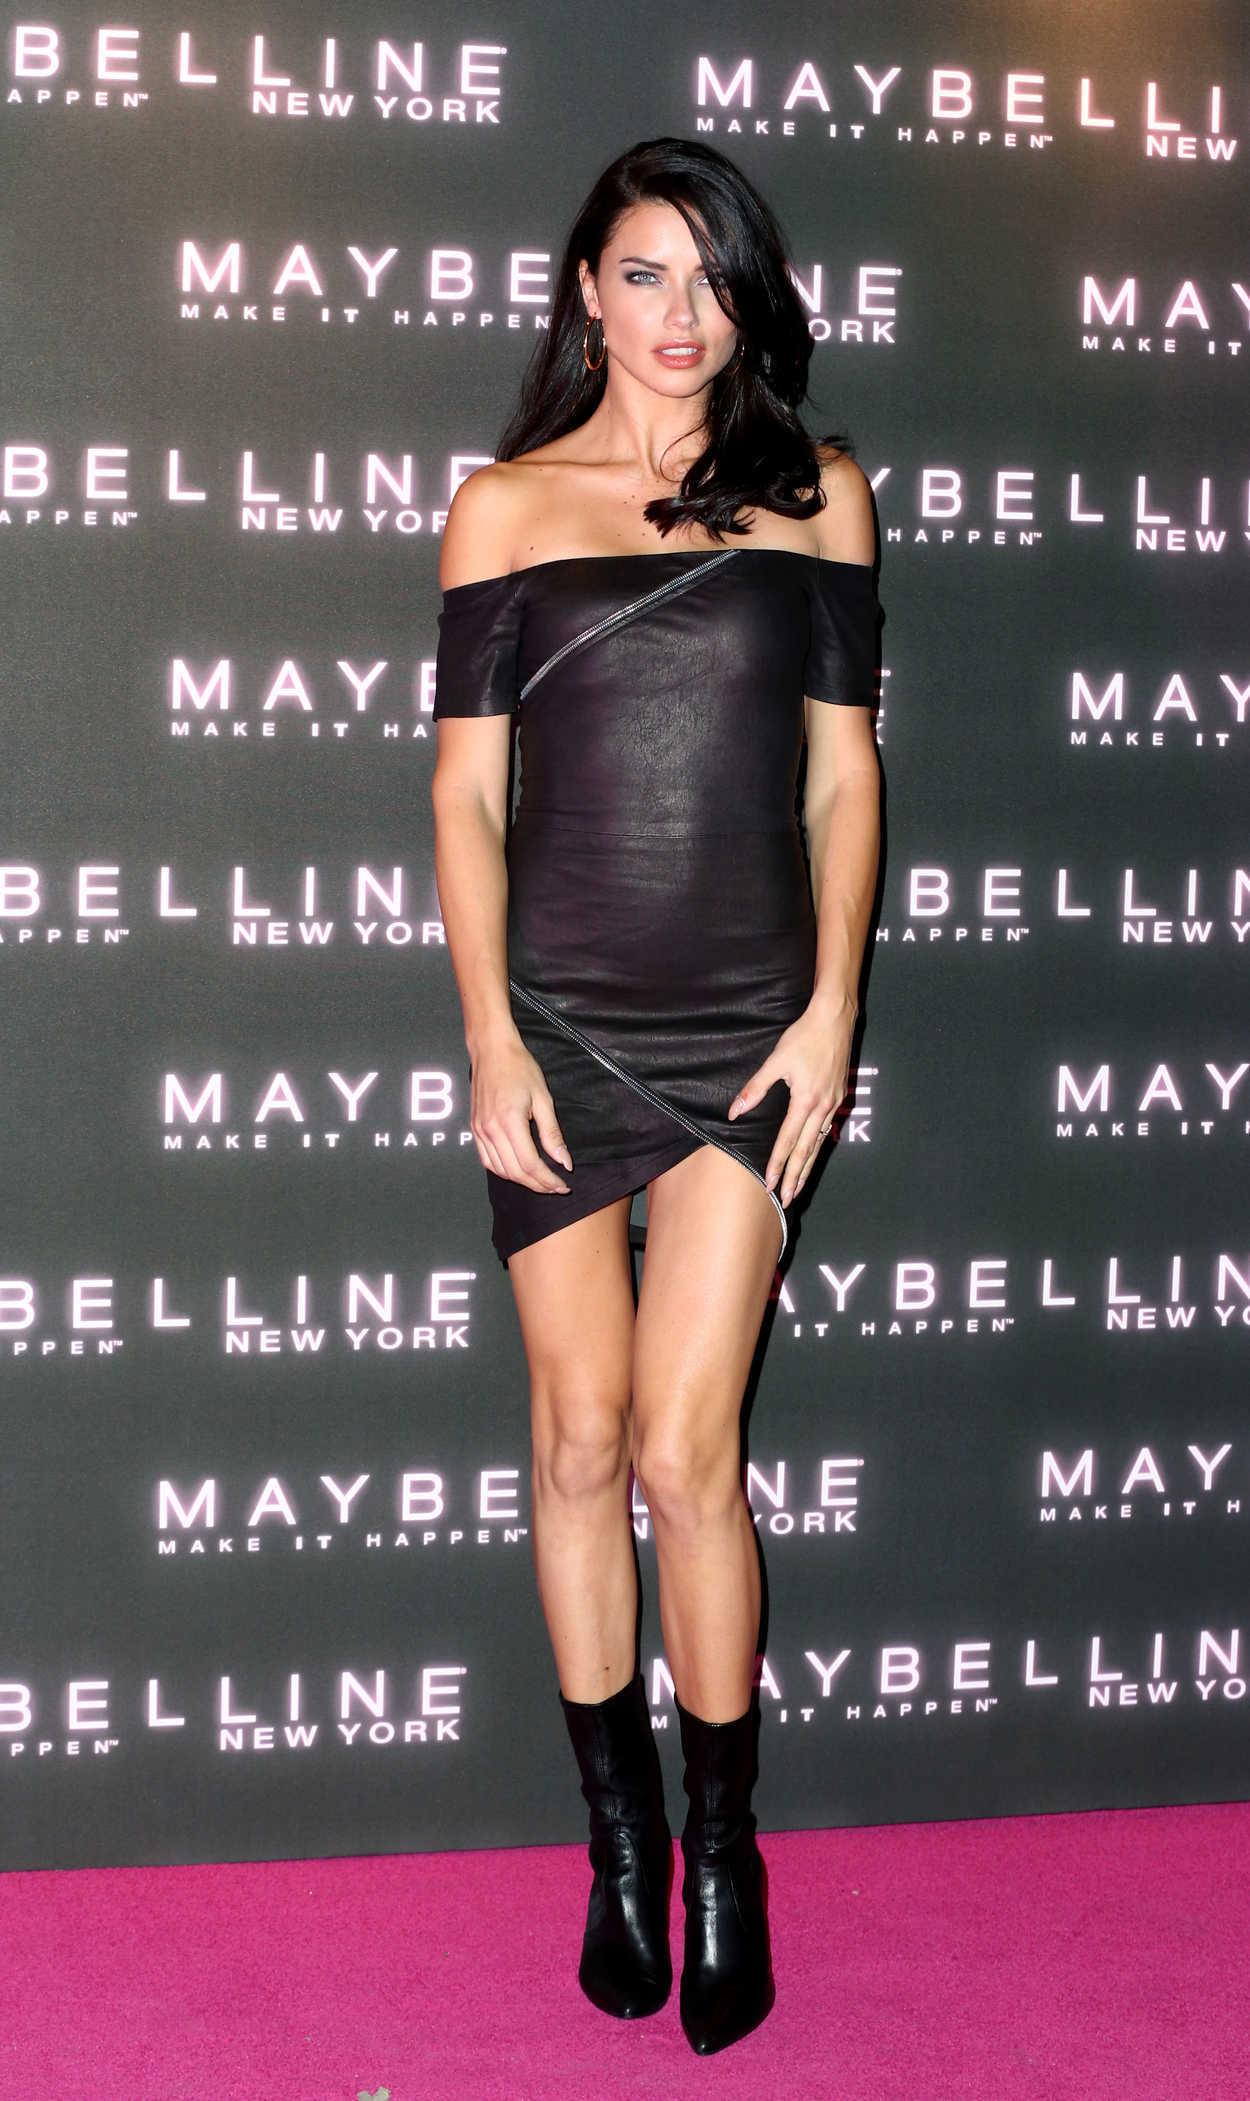 Maybelline Party London Fashion Week Lonodn